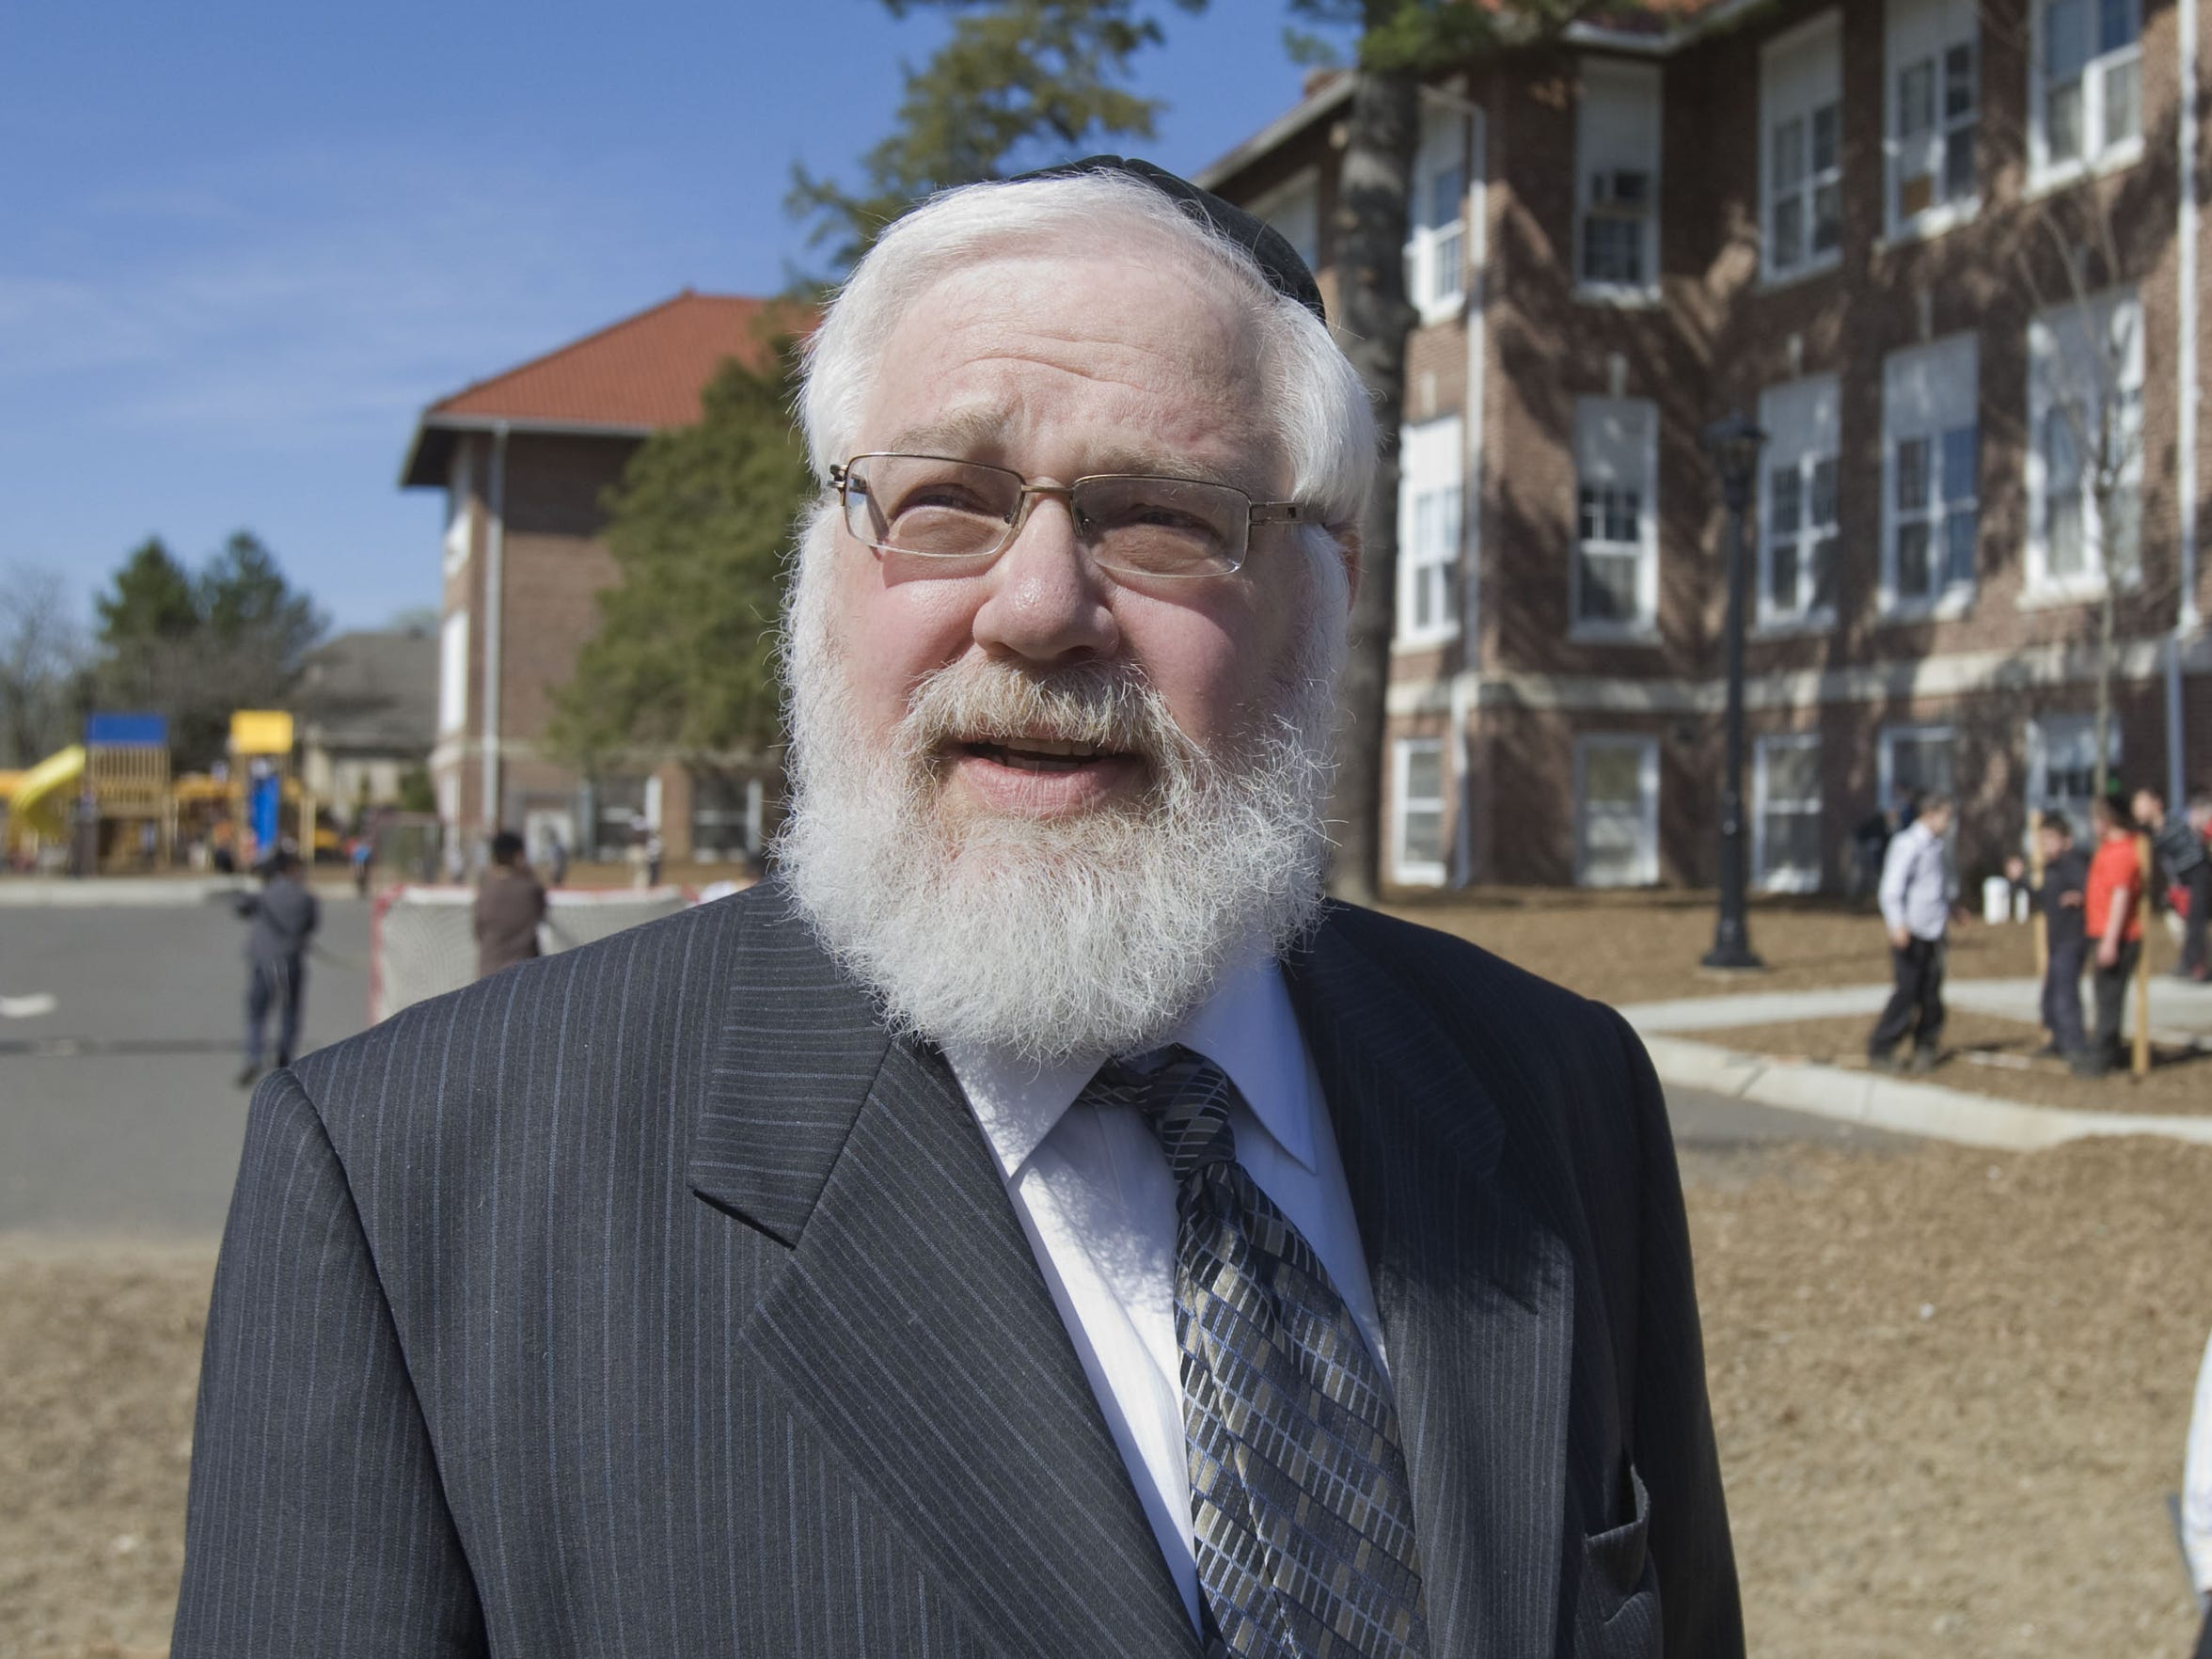 Rabbi Meir N. Hertz, dean of the Tashbar school in